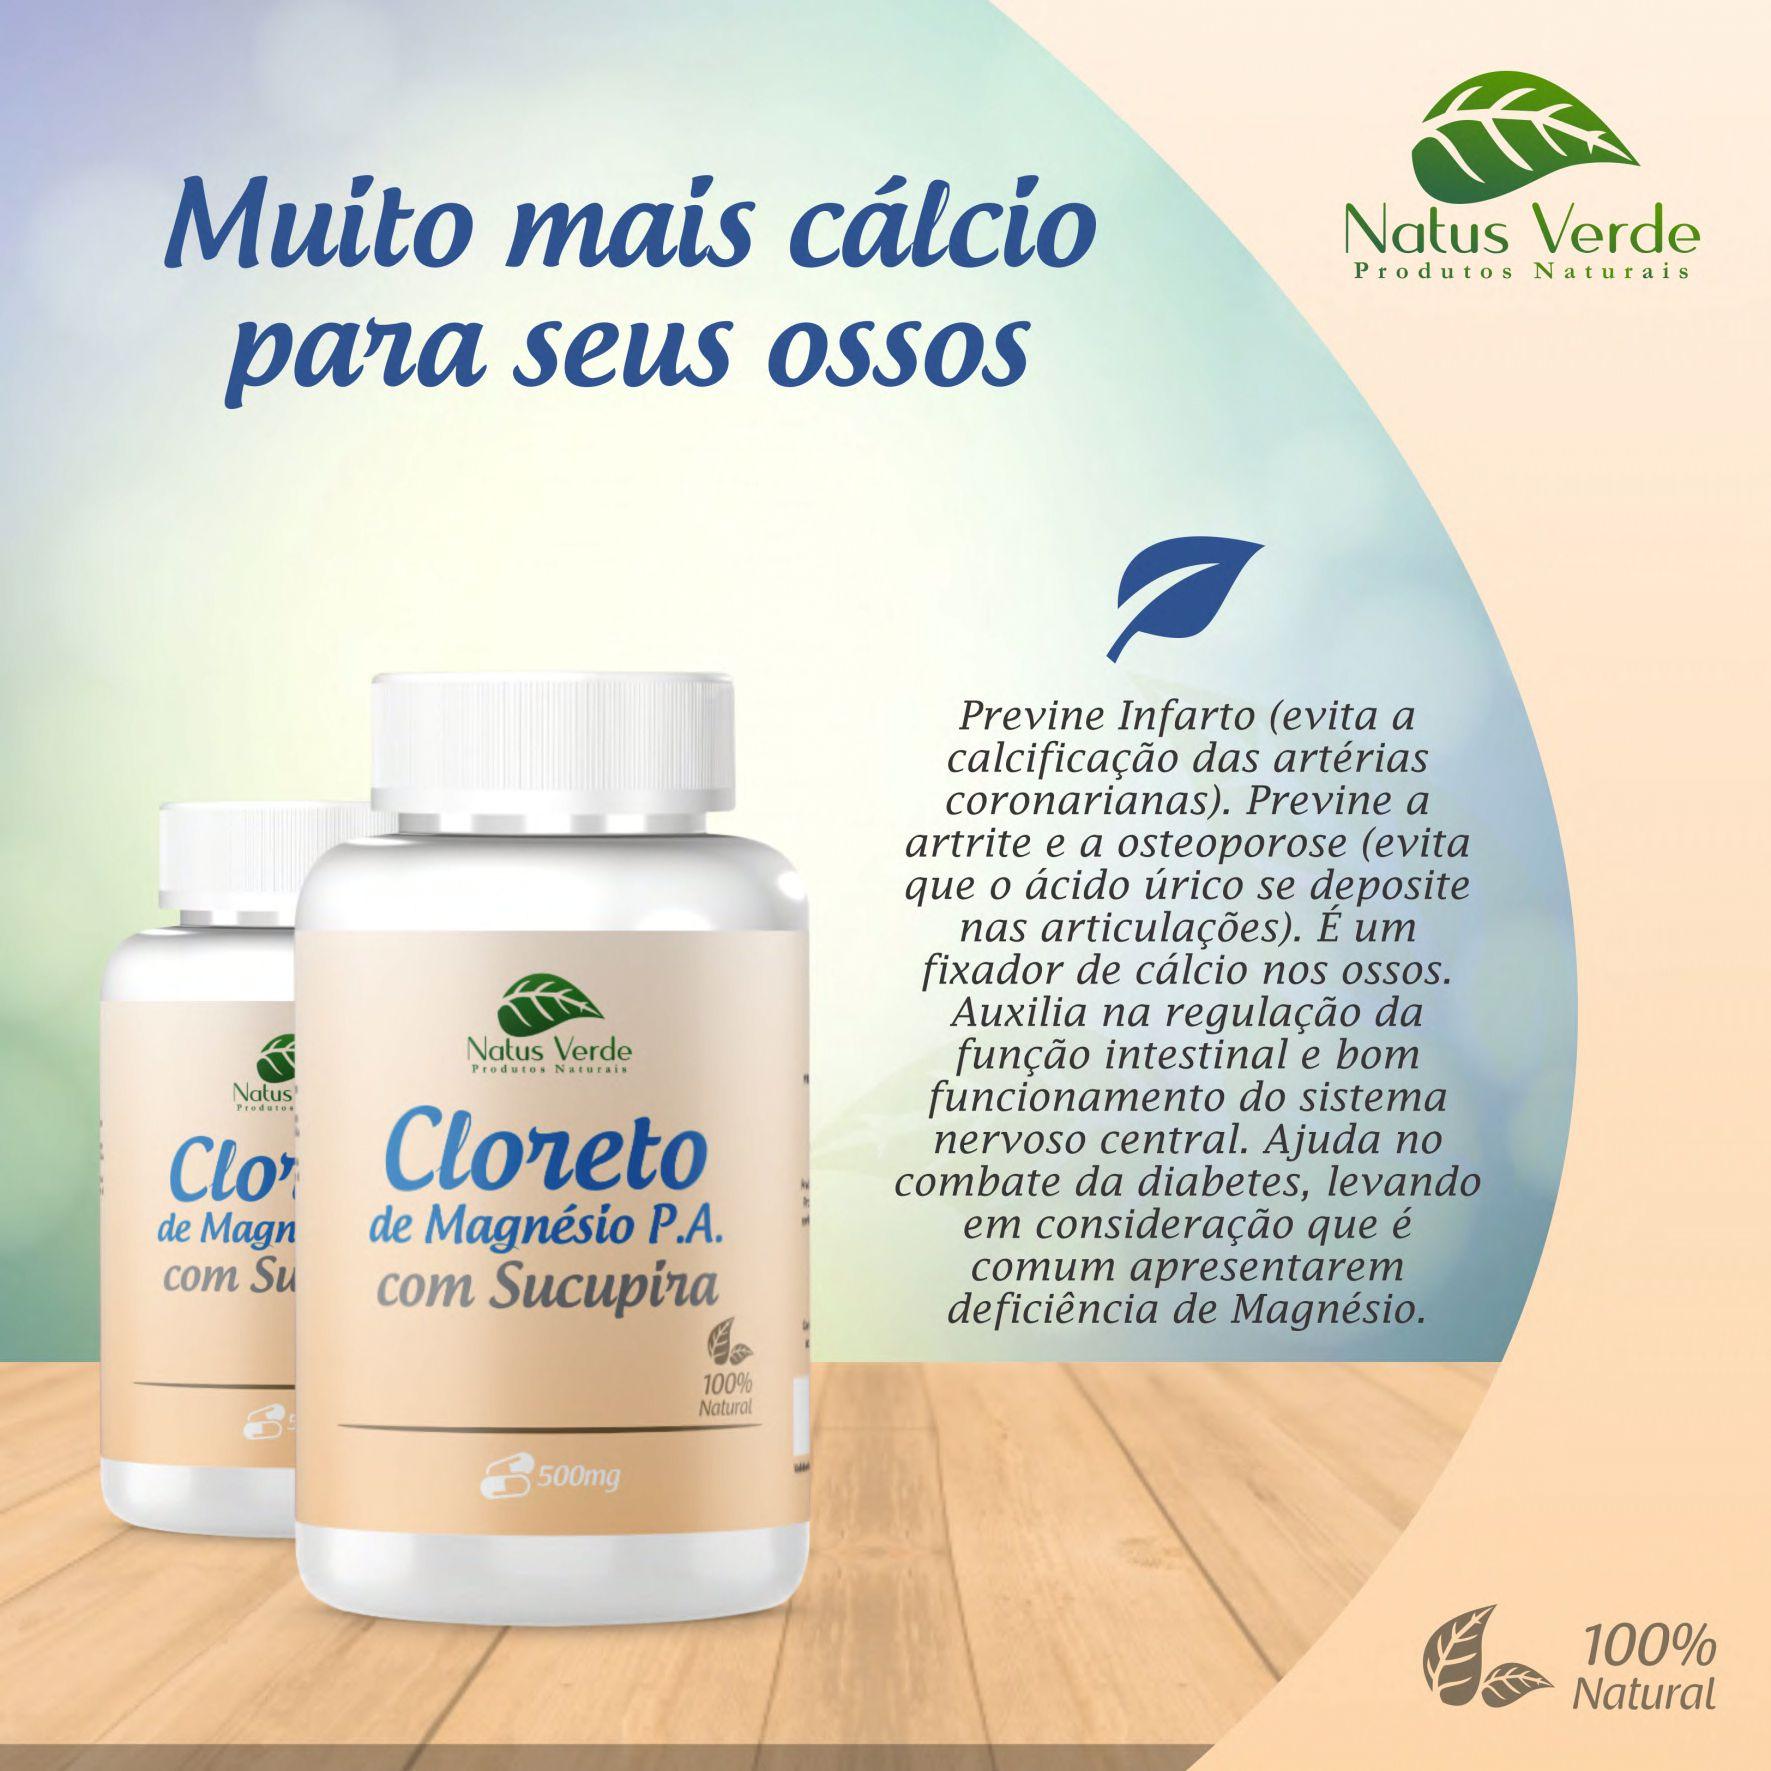 Composto natural Cloreto De Magnesio C/Sucupira 60 Caps Natus Verde  - Fribasex - Fabricasex.com